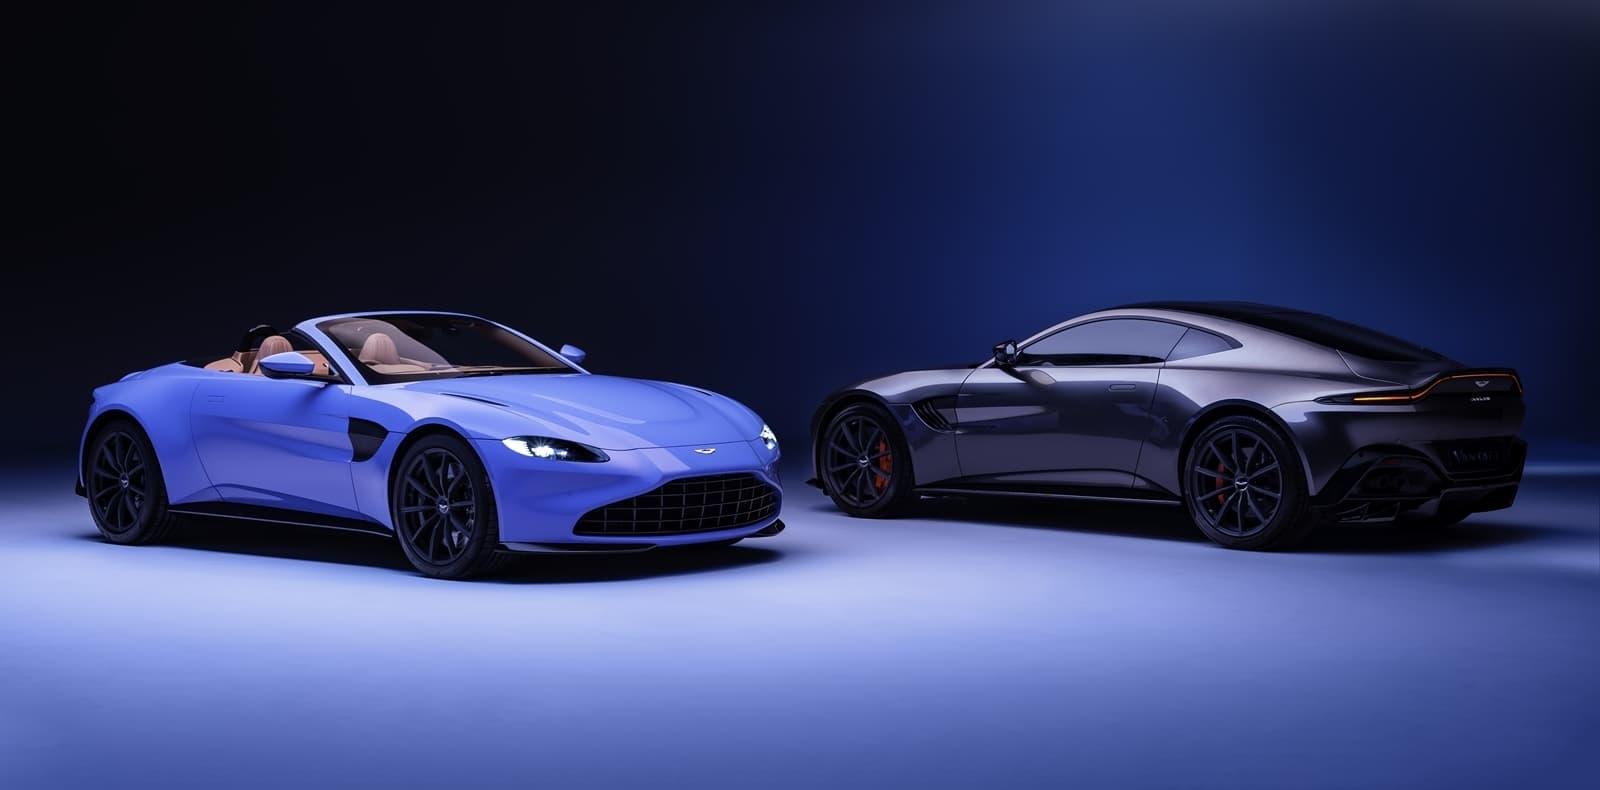 Aston Martin Vantage Roadster 0220 008